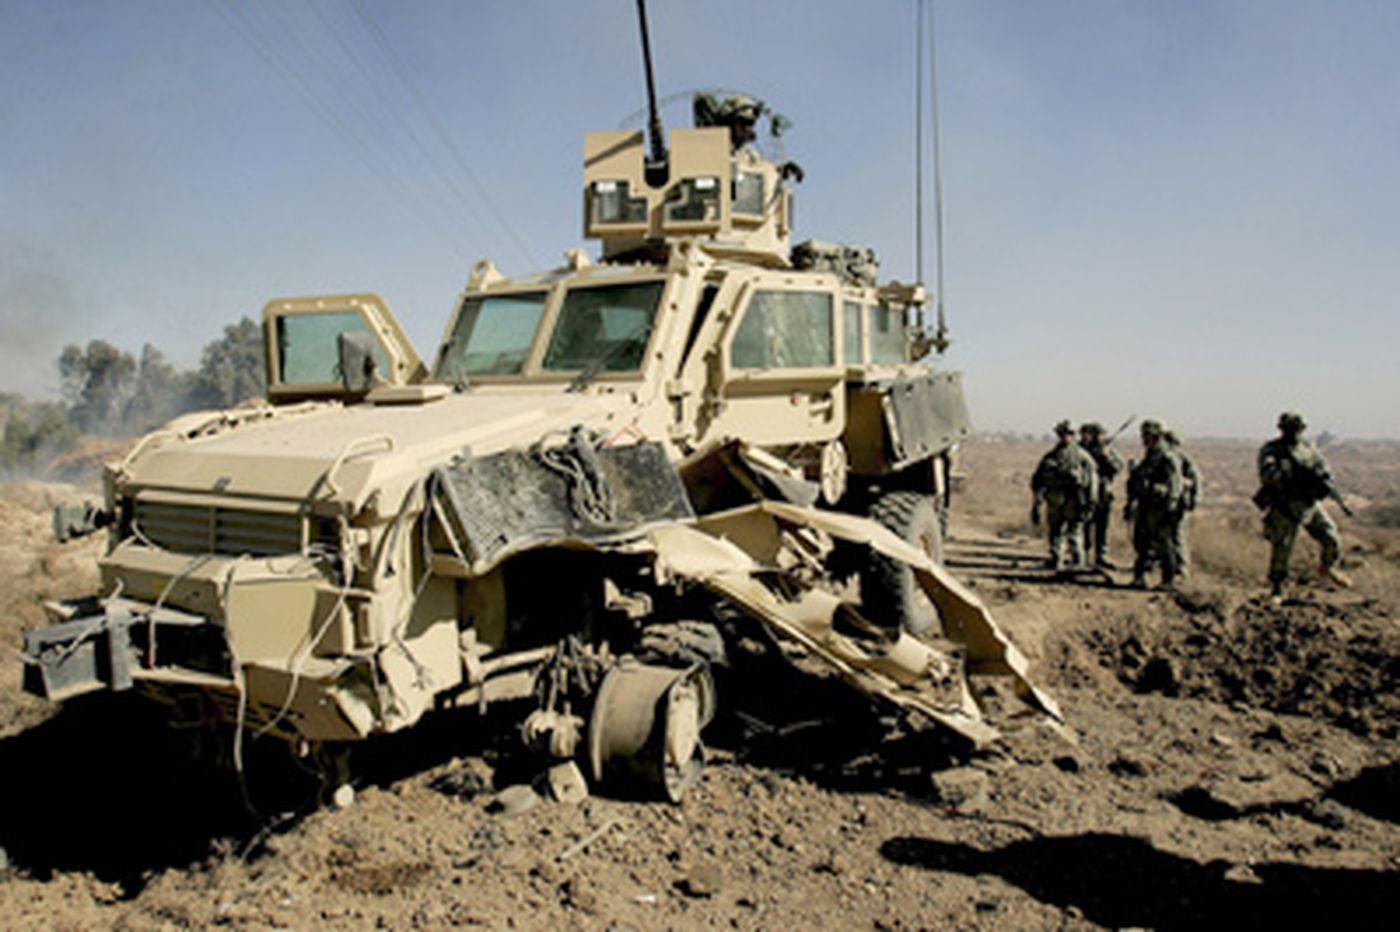 Villanova researchers seek ways to beef up military armor